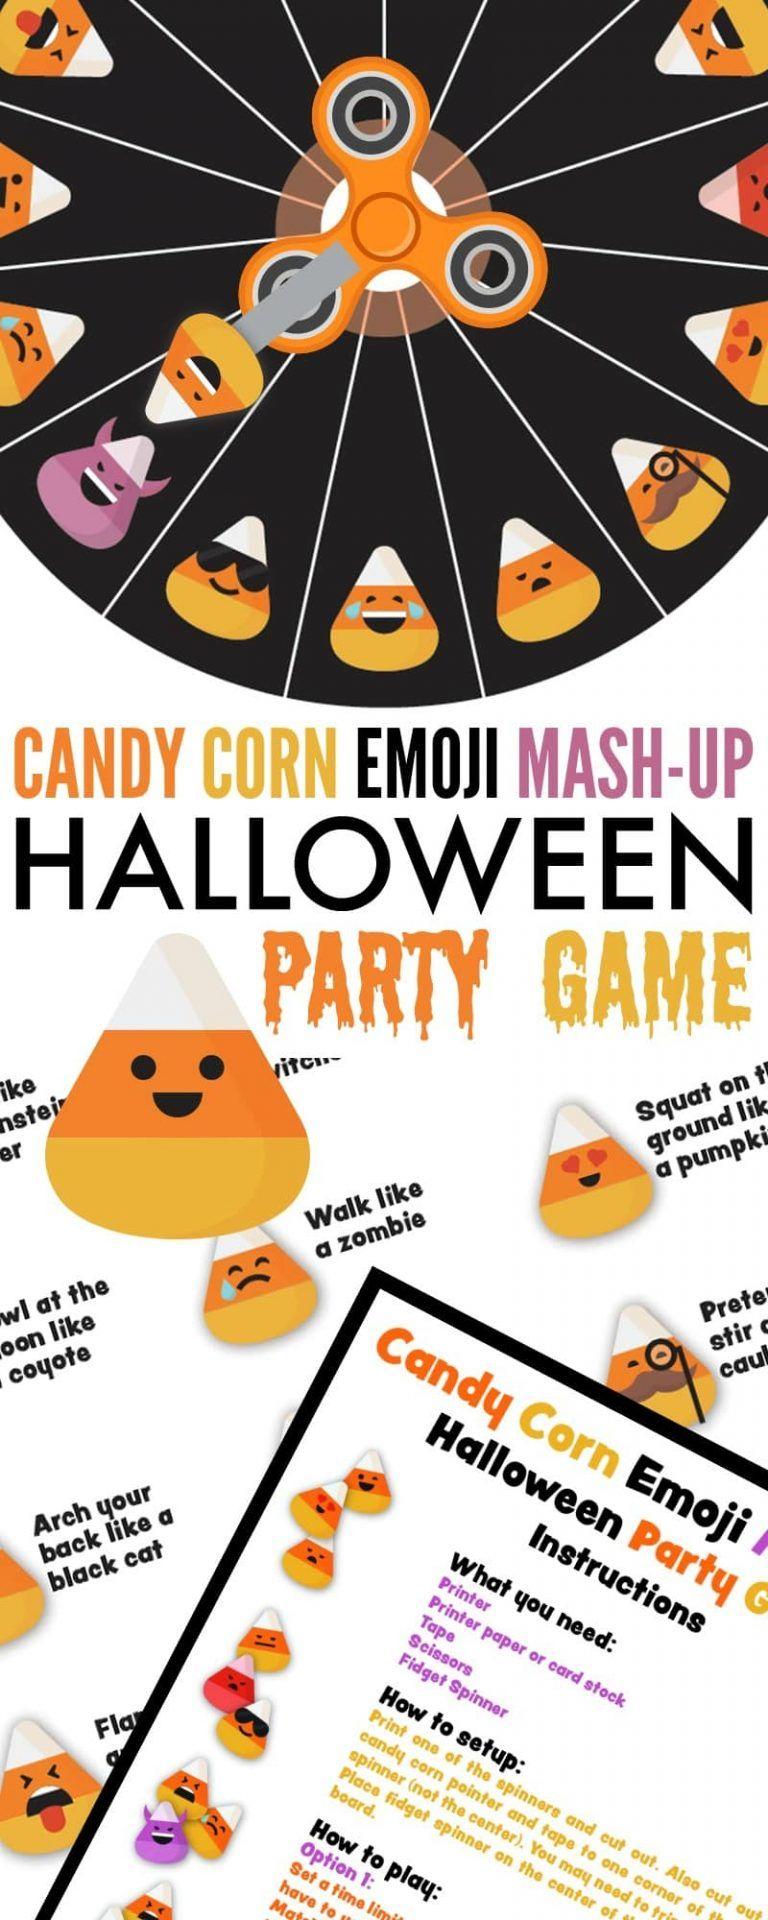 Candy Corn Emoji Mash-Up Halloween Party Game   School   Halloween - Free Printable Halloween Party Games